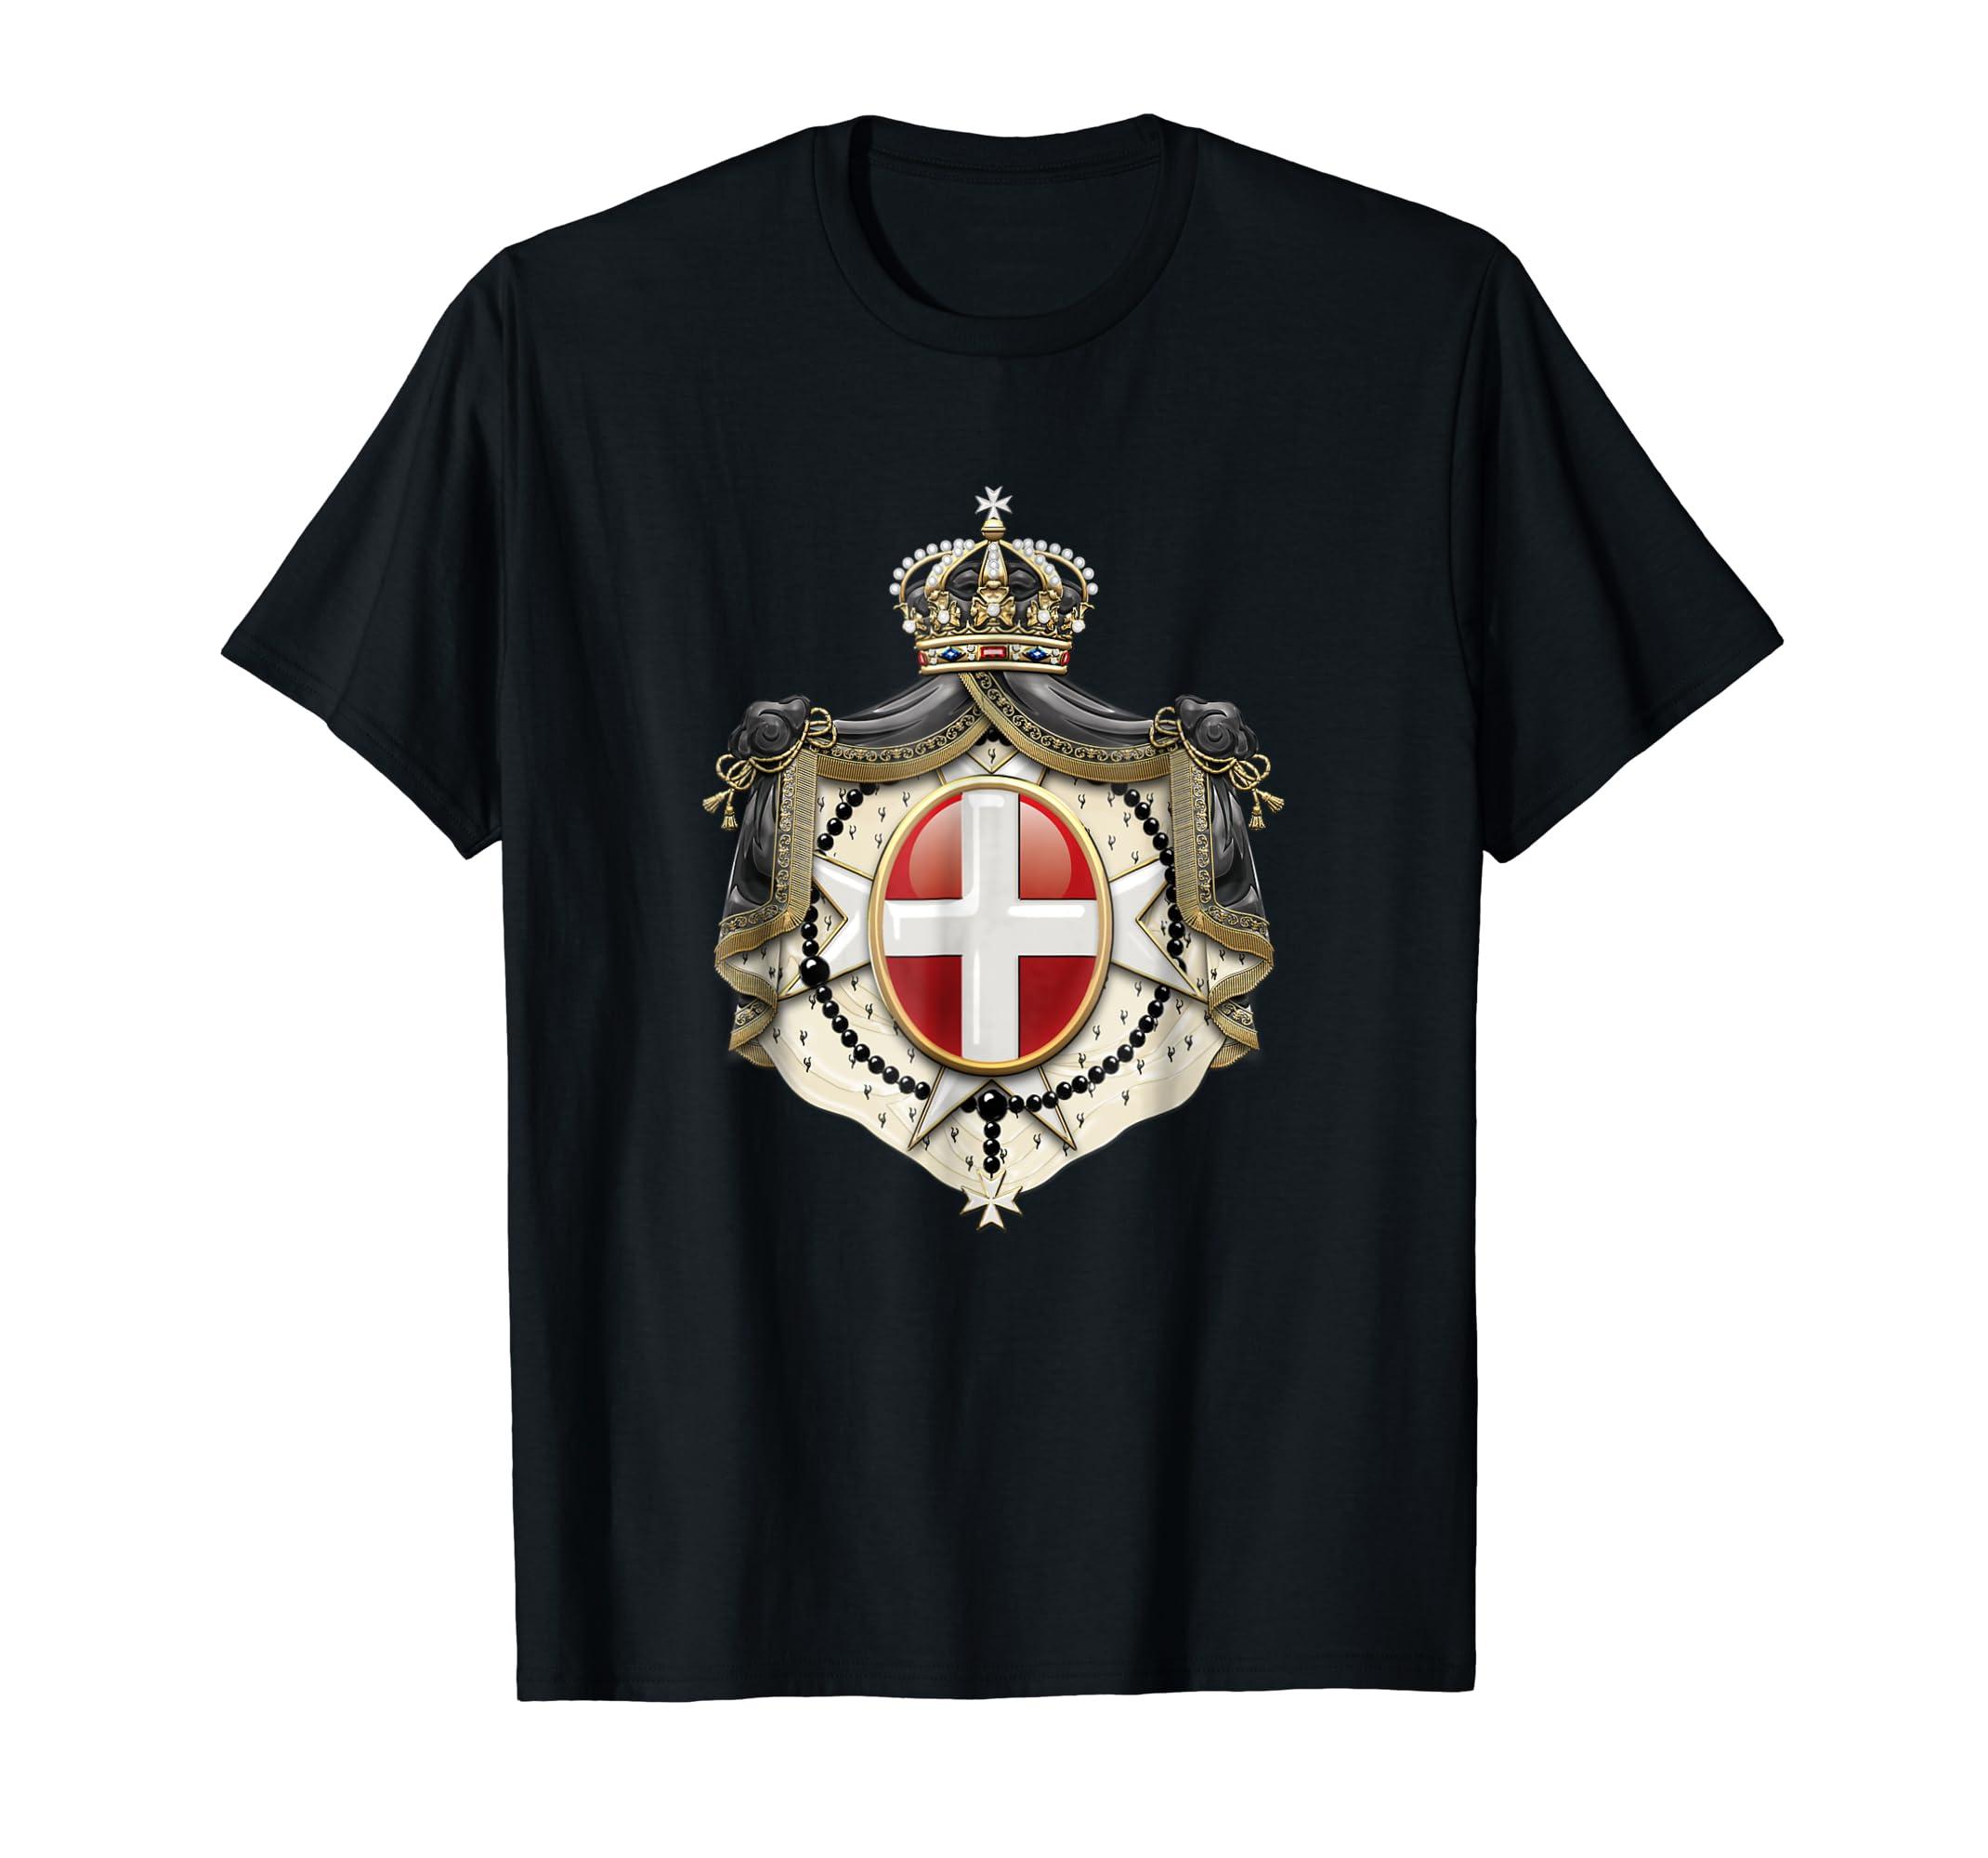 acdee88b Amazon.com: Dot7Art: Order of Malta Coat of Arms T-shirt: Clothing